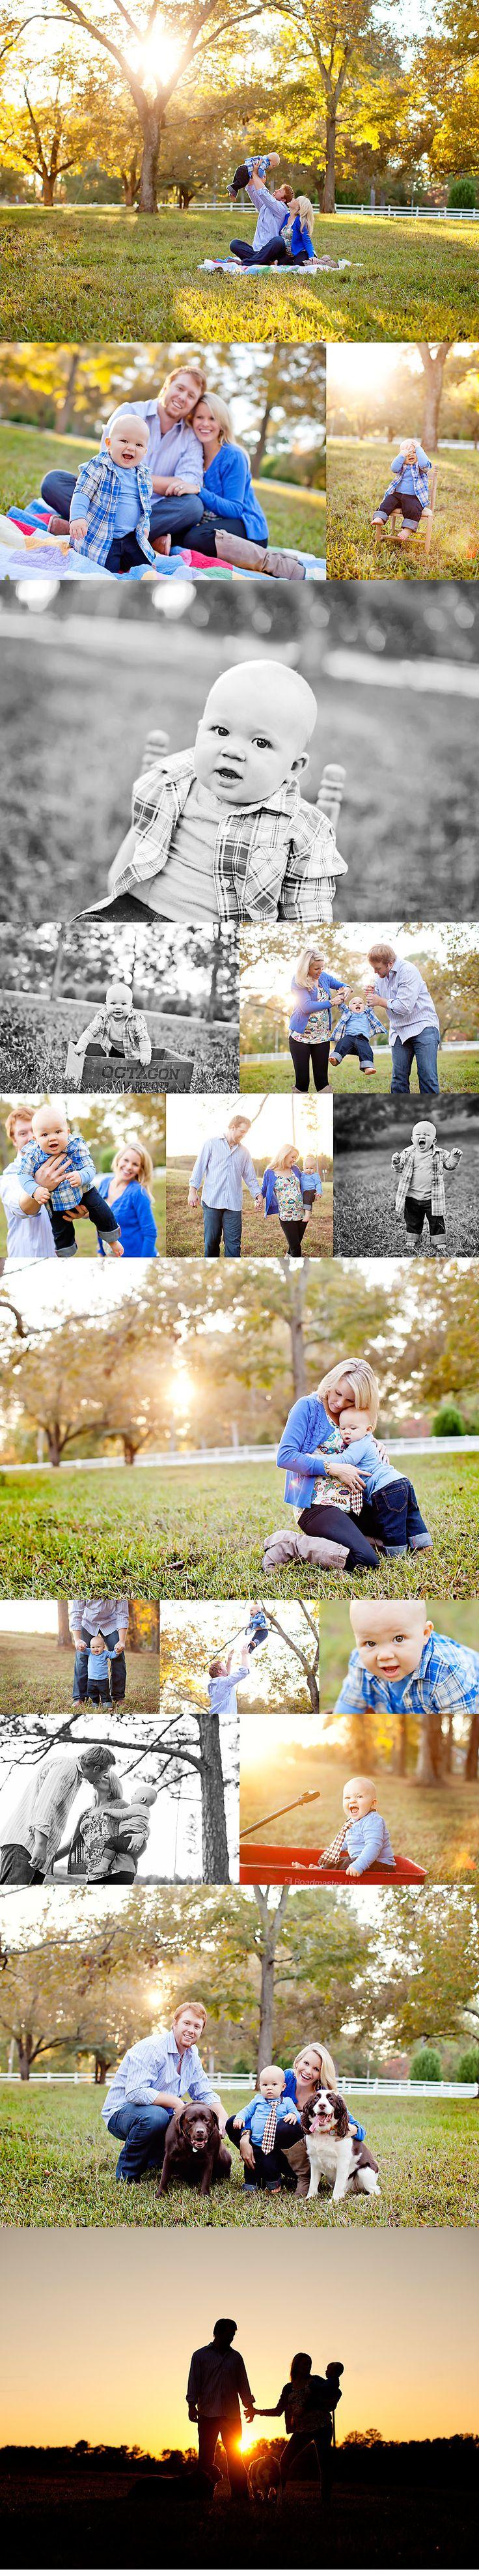 family shoot with a toddler - jenn mac